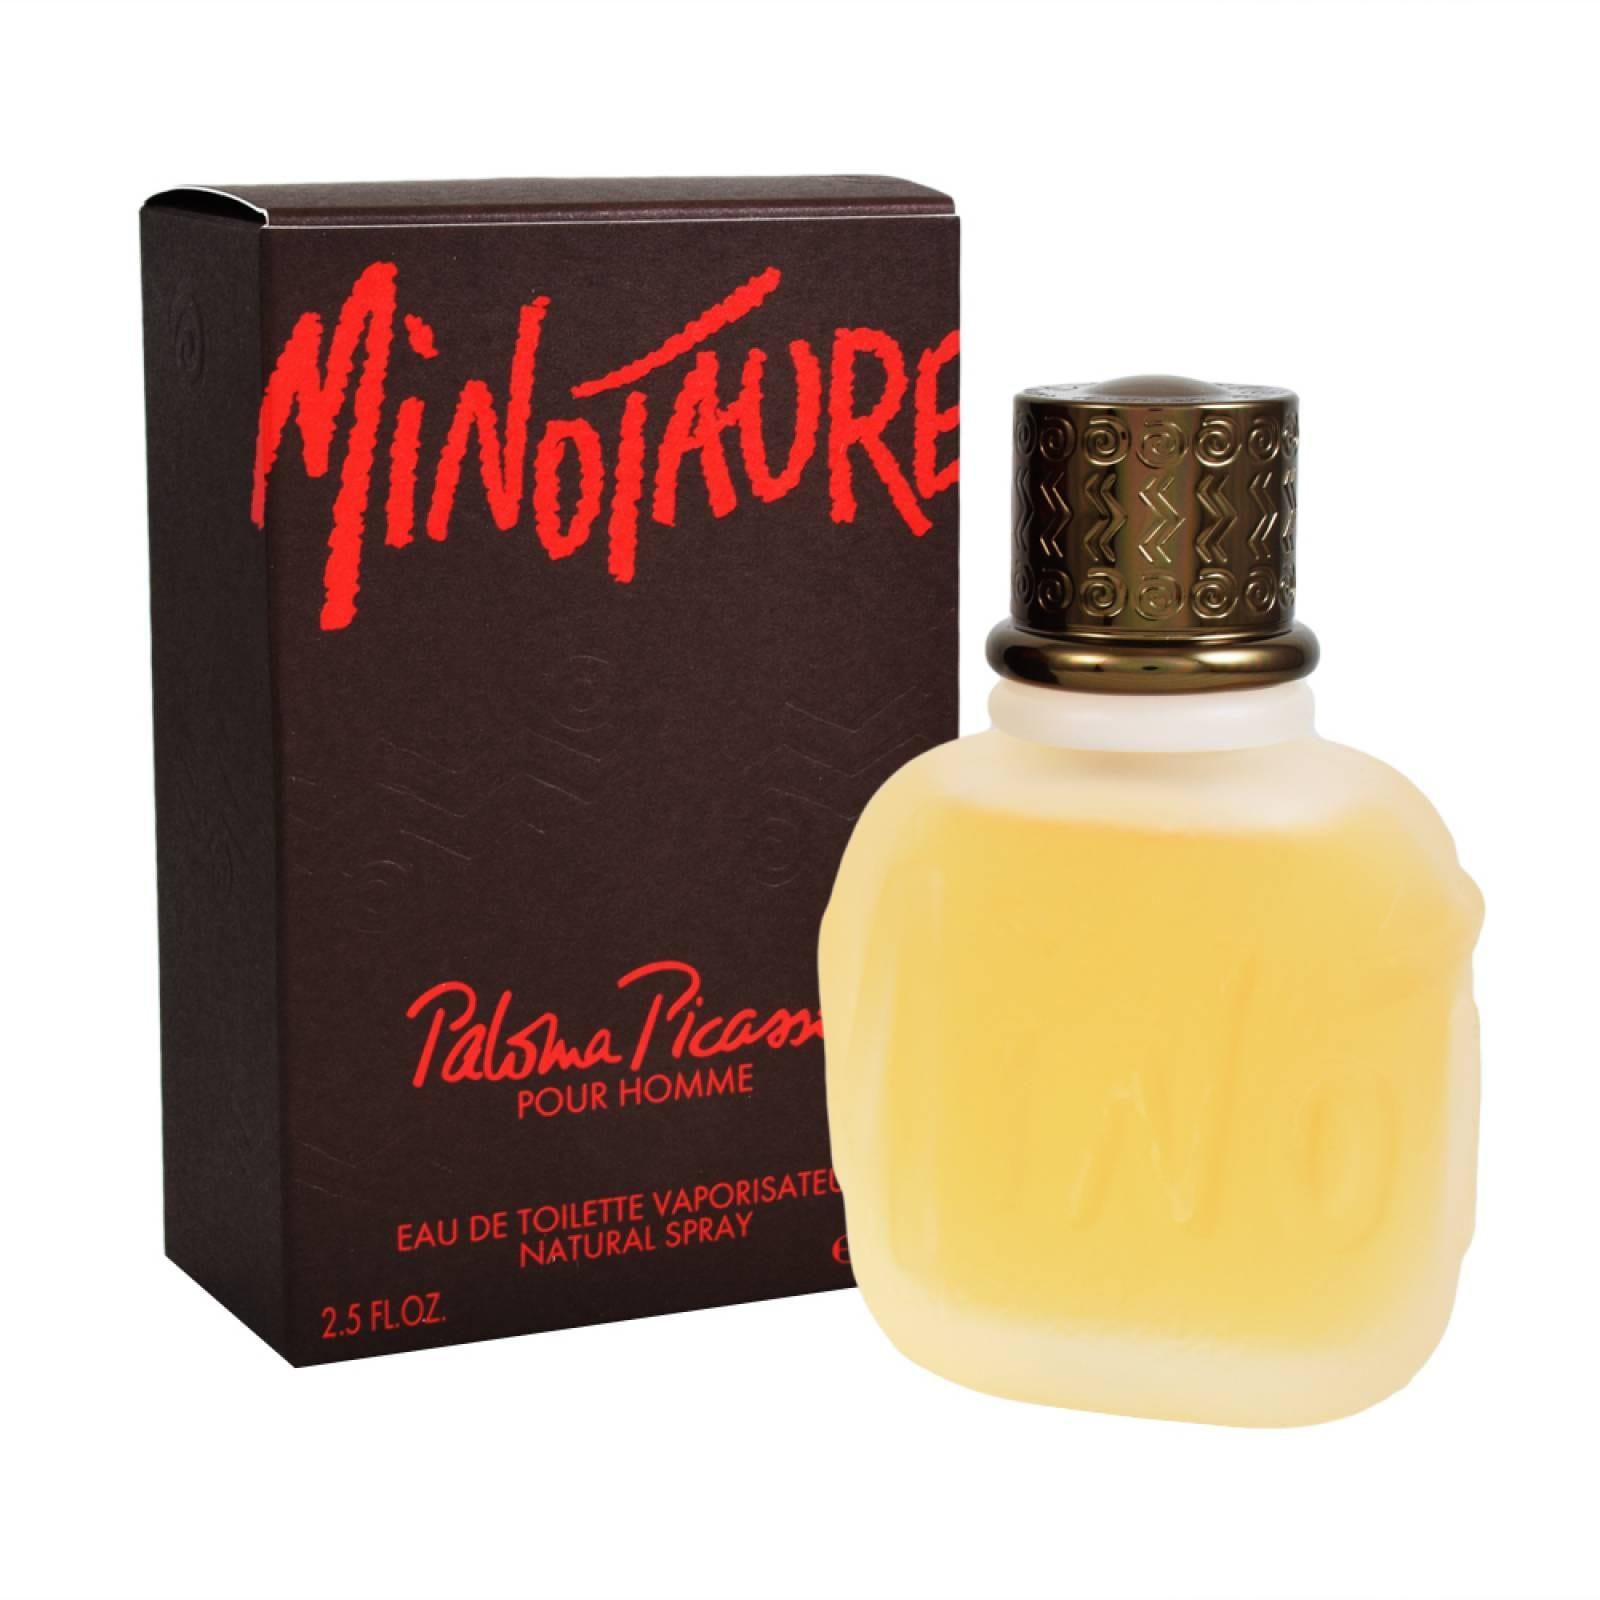 Minotaure 75 ml Eau de Toilette Spray de Paloma Picasso Fragancia para Caballero